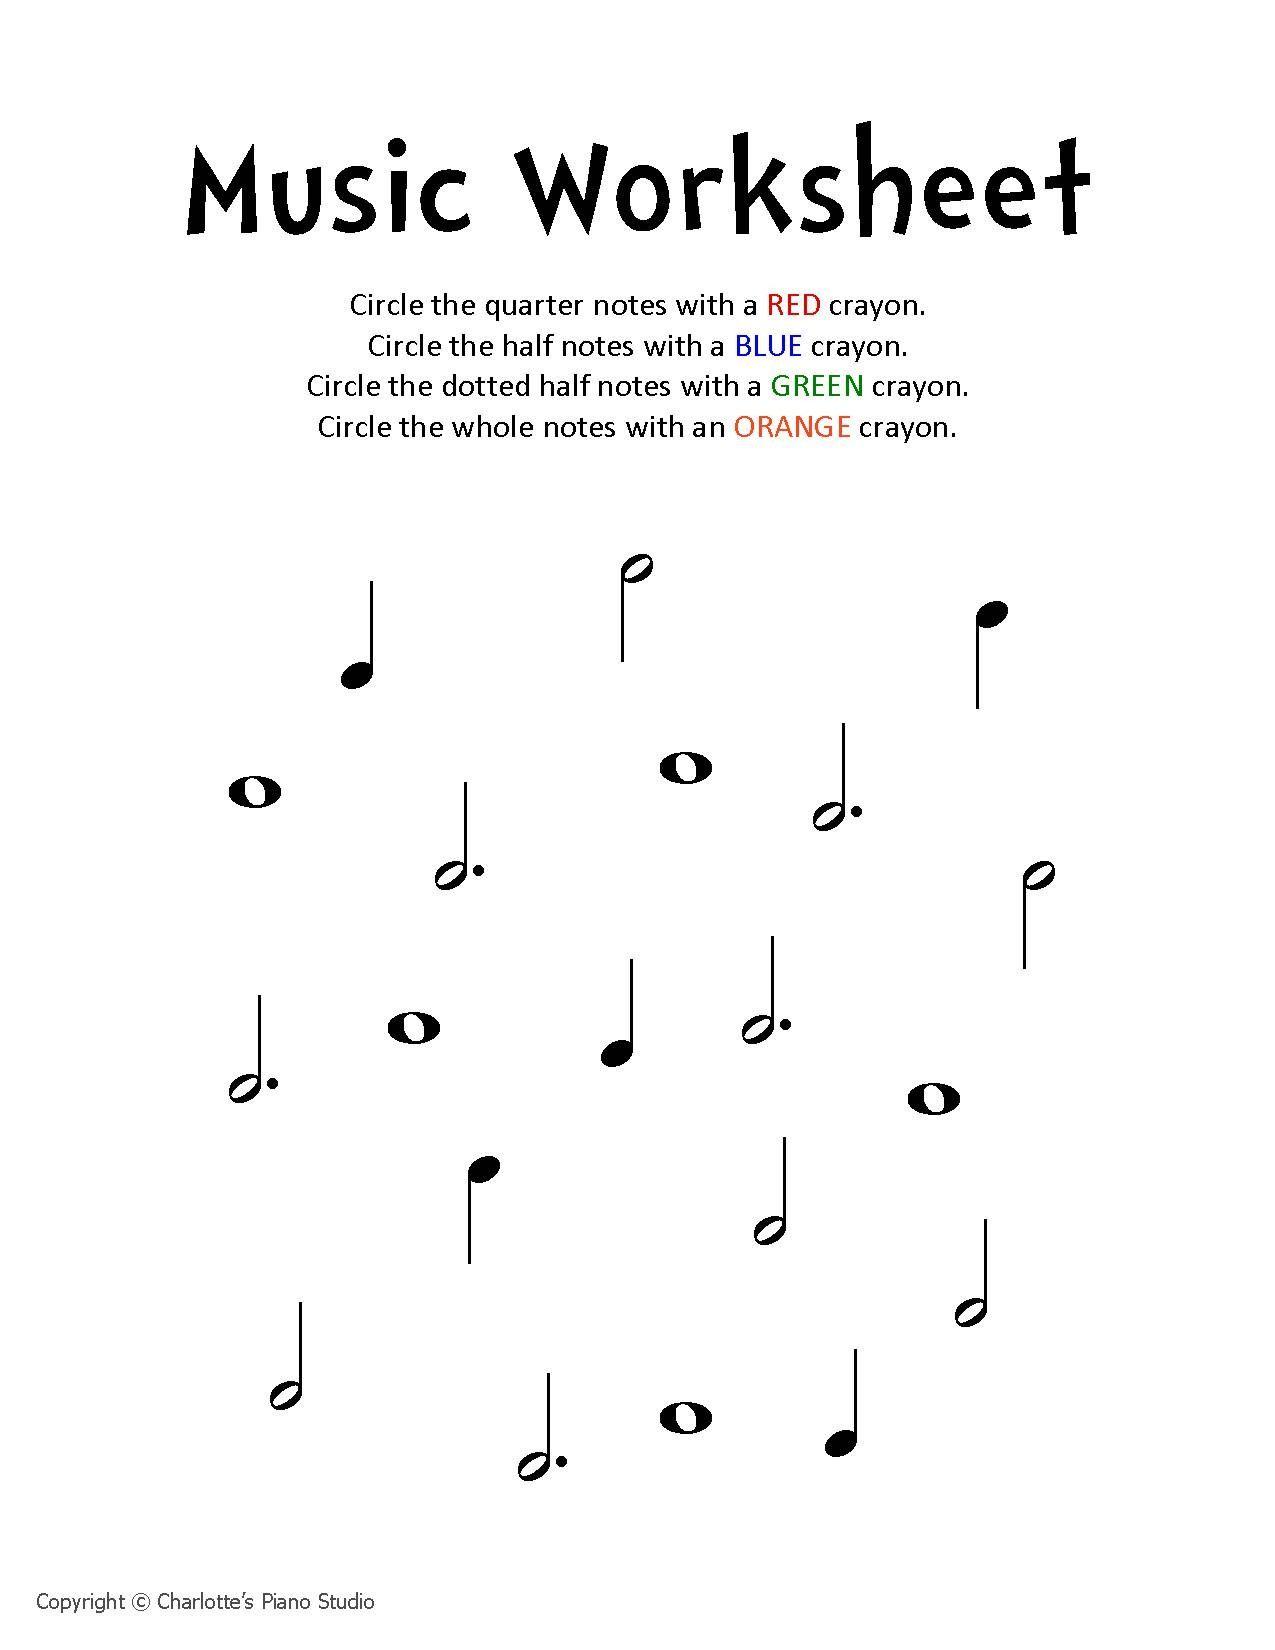 Worksheet elementary music worksheets grass fedjp worksheet christy lovenduski teaching studio elementary music document click here biocorpaavc Choice Image